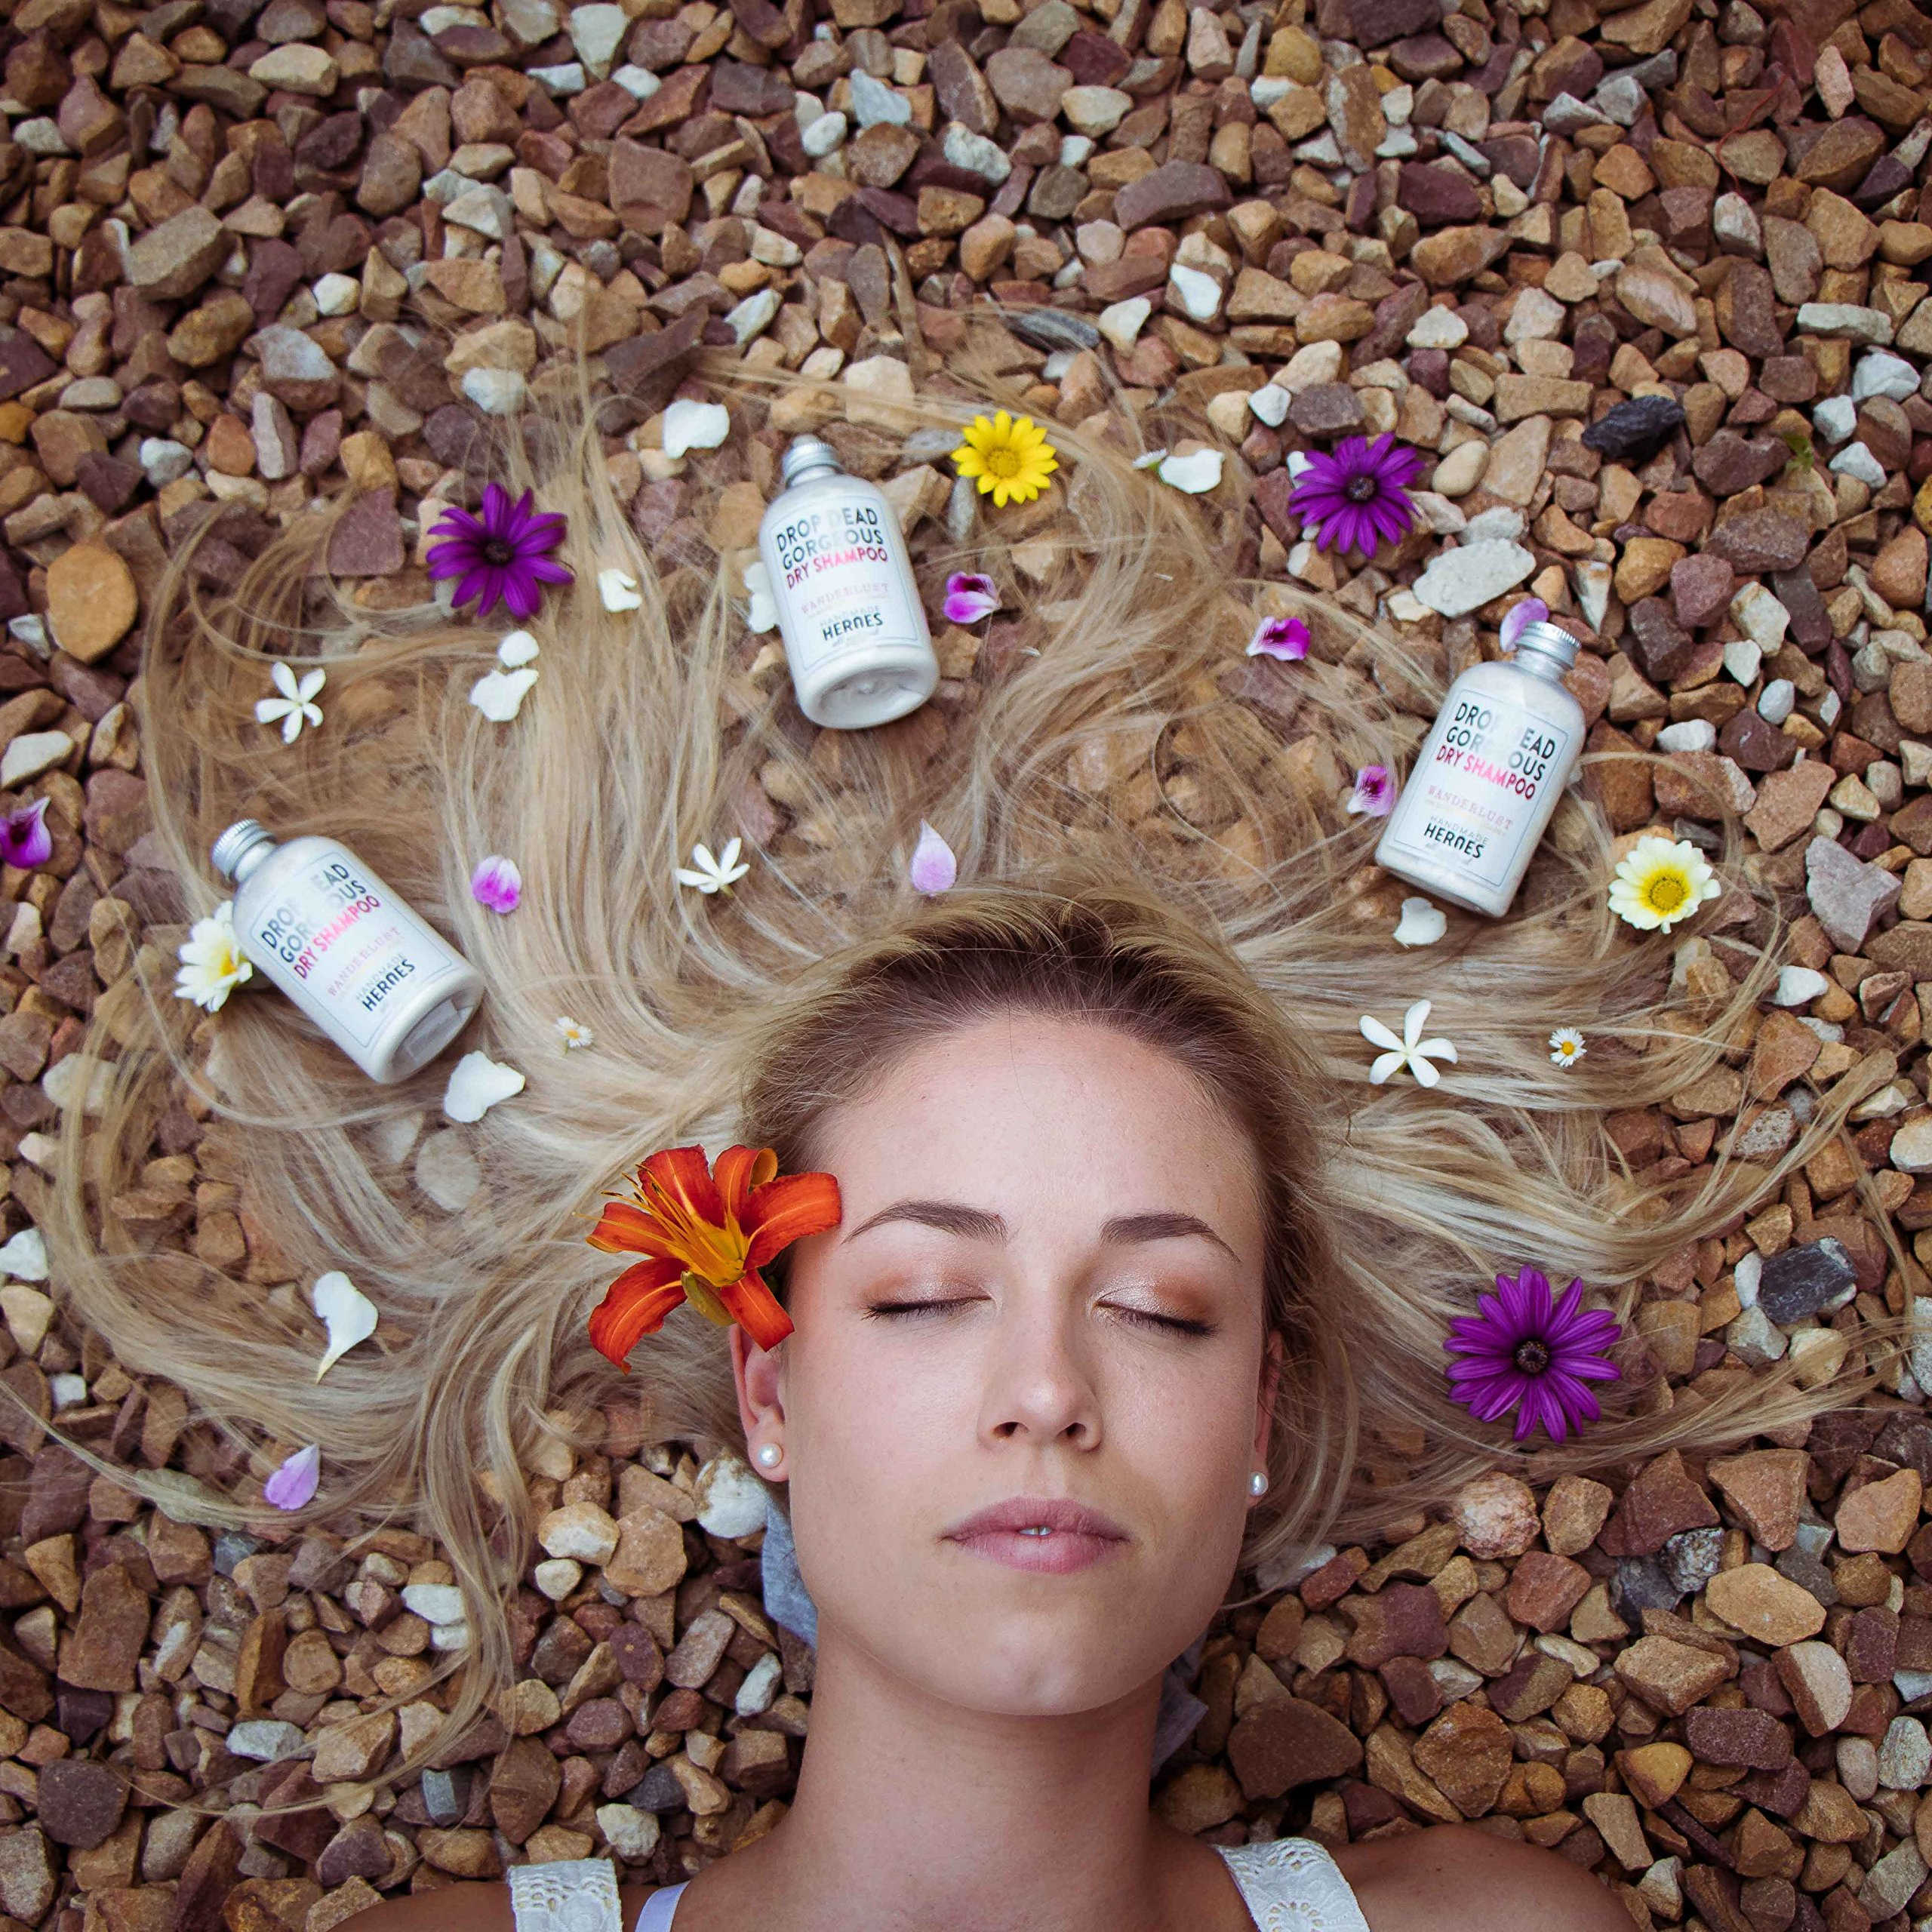 Natural Vegan Dry Shampoo Powder for Light Hair Blondes (2.4oz) by Handmade Heroes (Image #2)